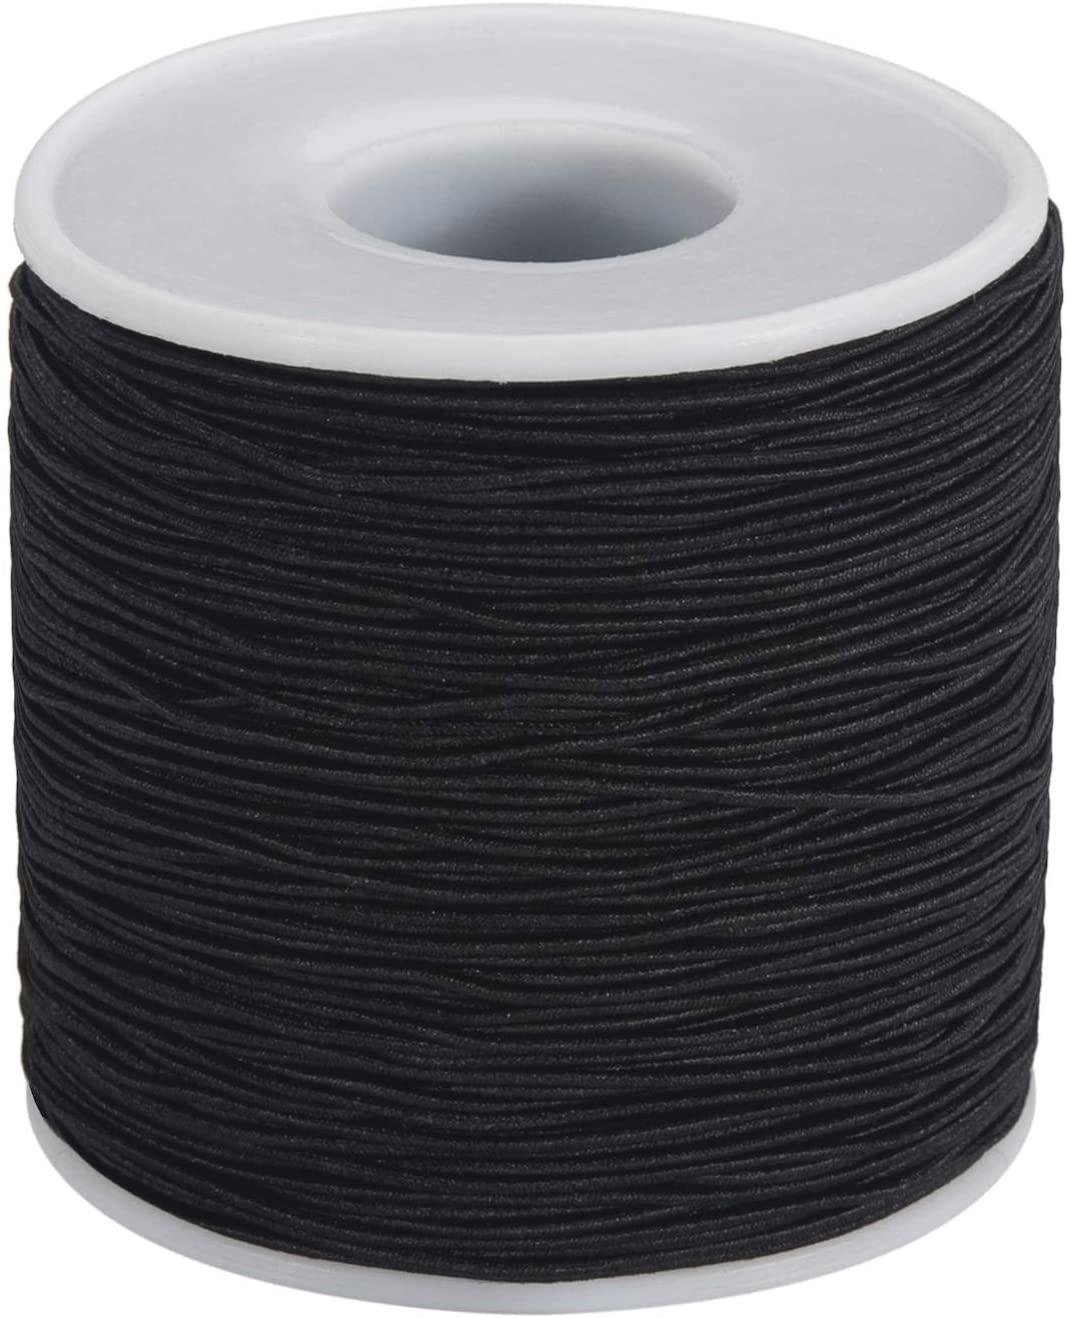 1mm Elastic Cord Beading Cord (164 Yards) Elastic String Gewelry Stretchy Cord Crafting Cord, Stretchy String for Bracelet, Beading Thread for Jewelry Making (Black)